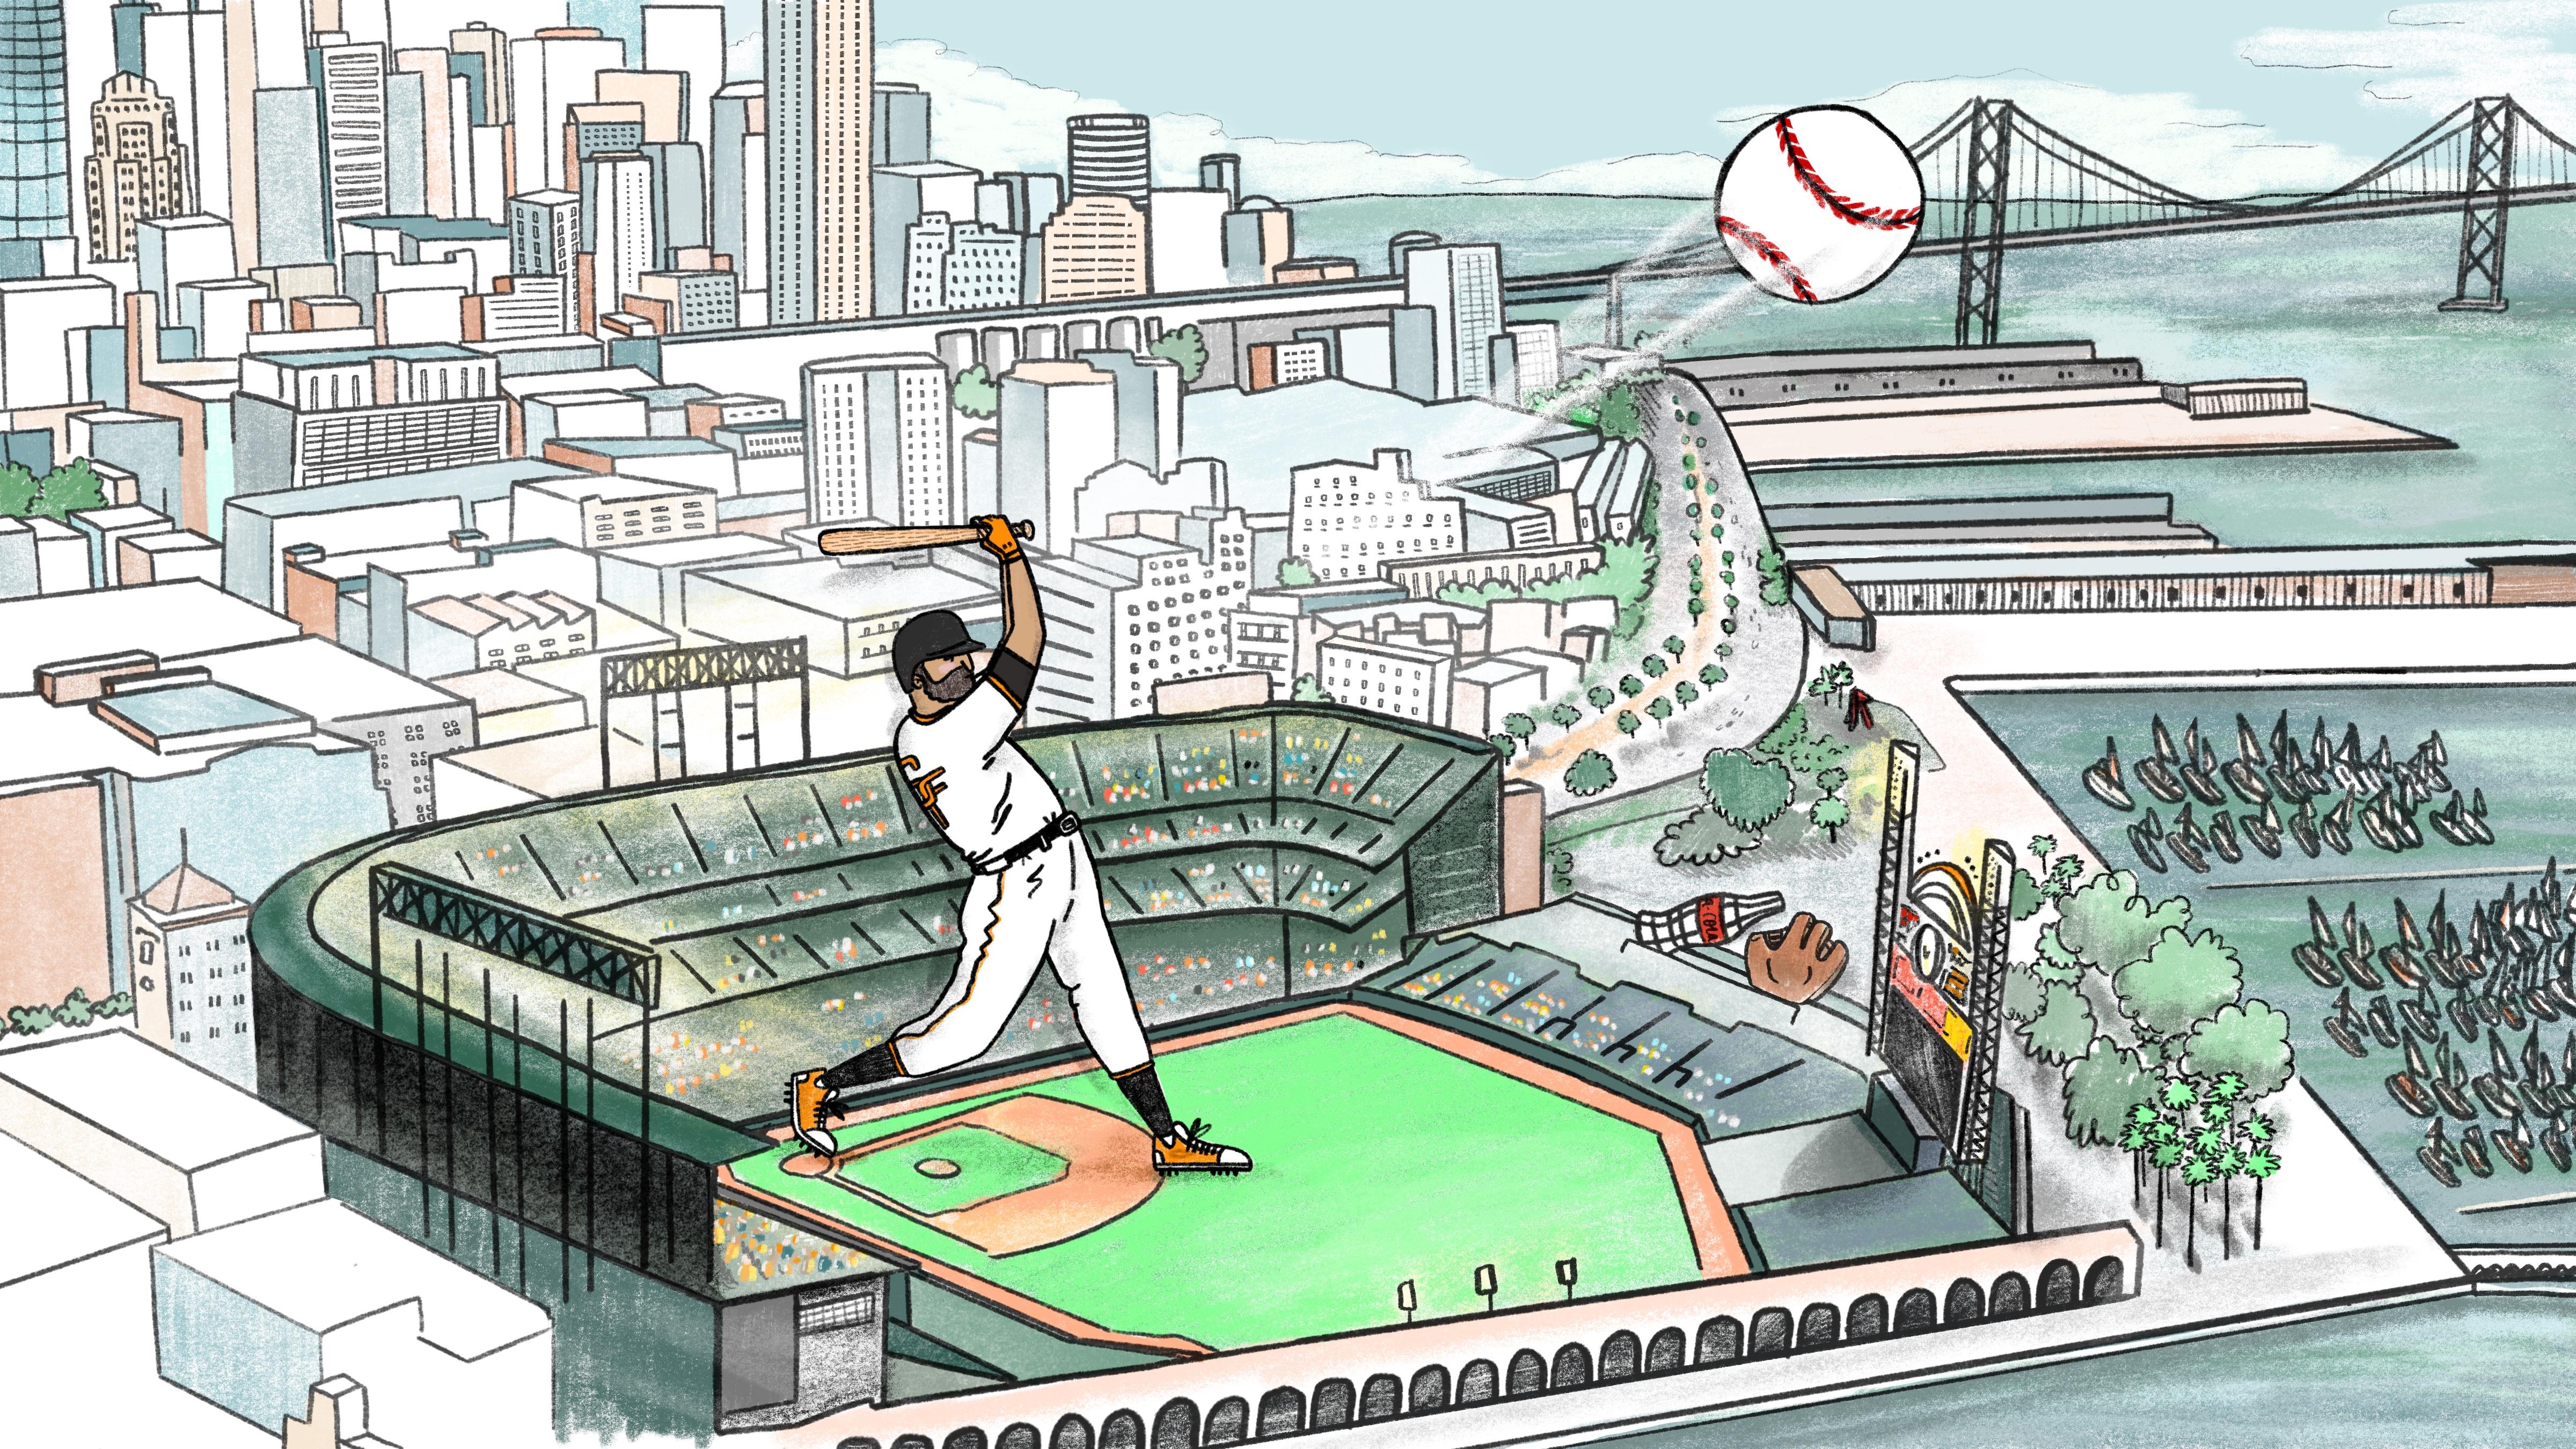 An illustration of a baseball player hitting a baseball out of a stadium with a baseball bat.